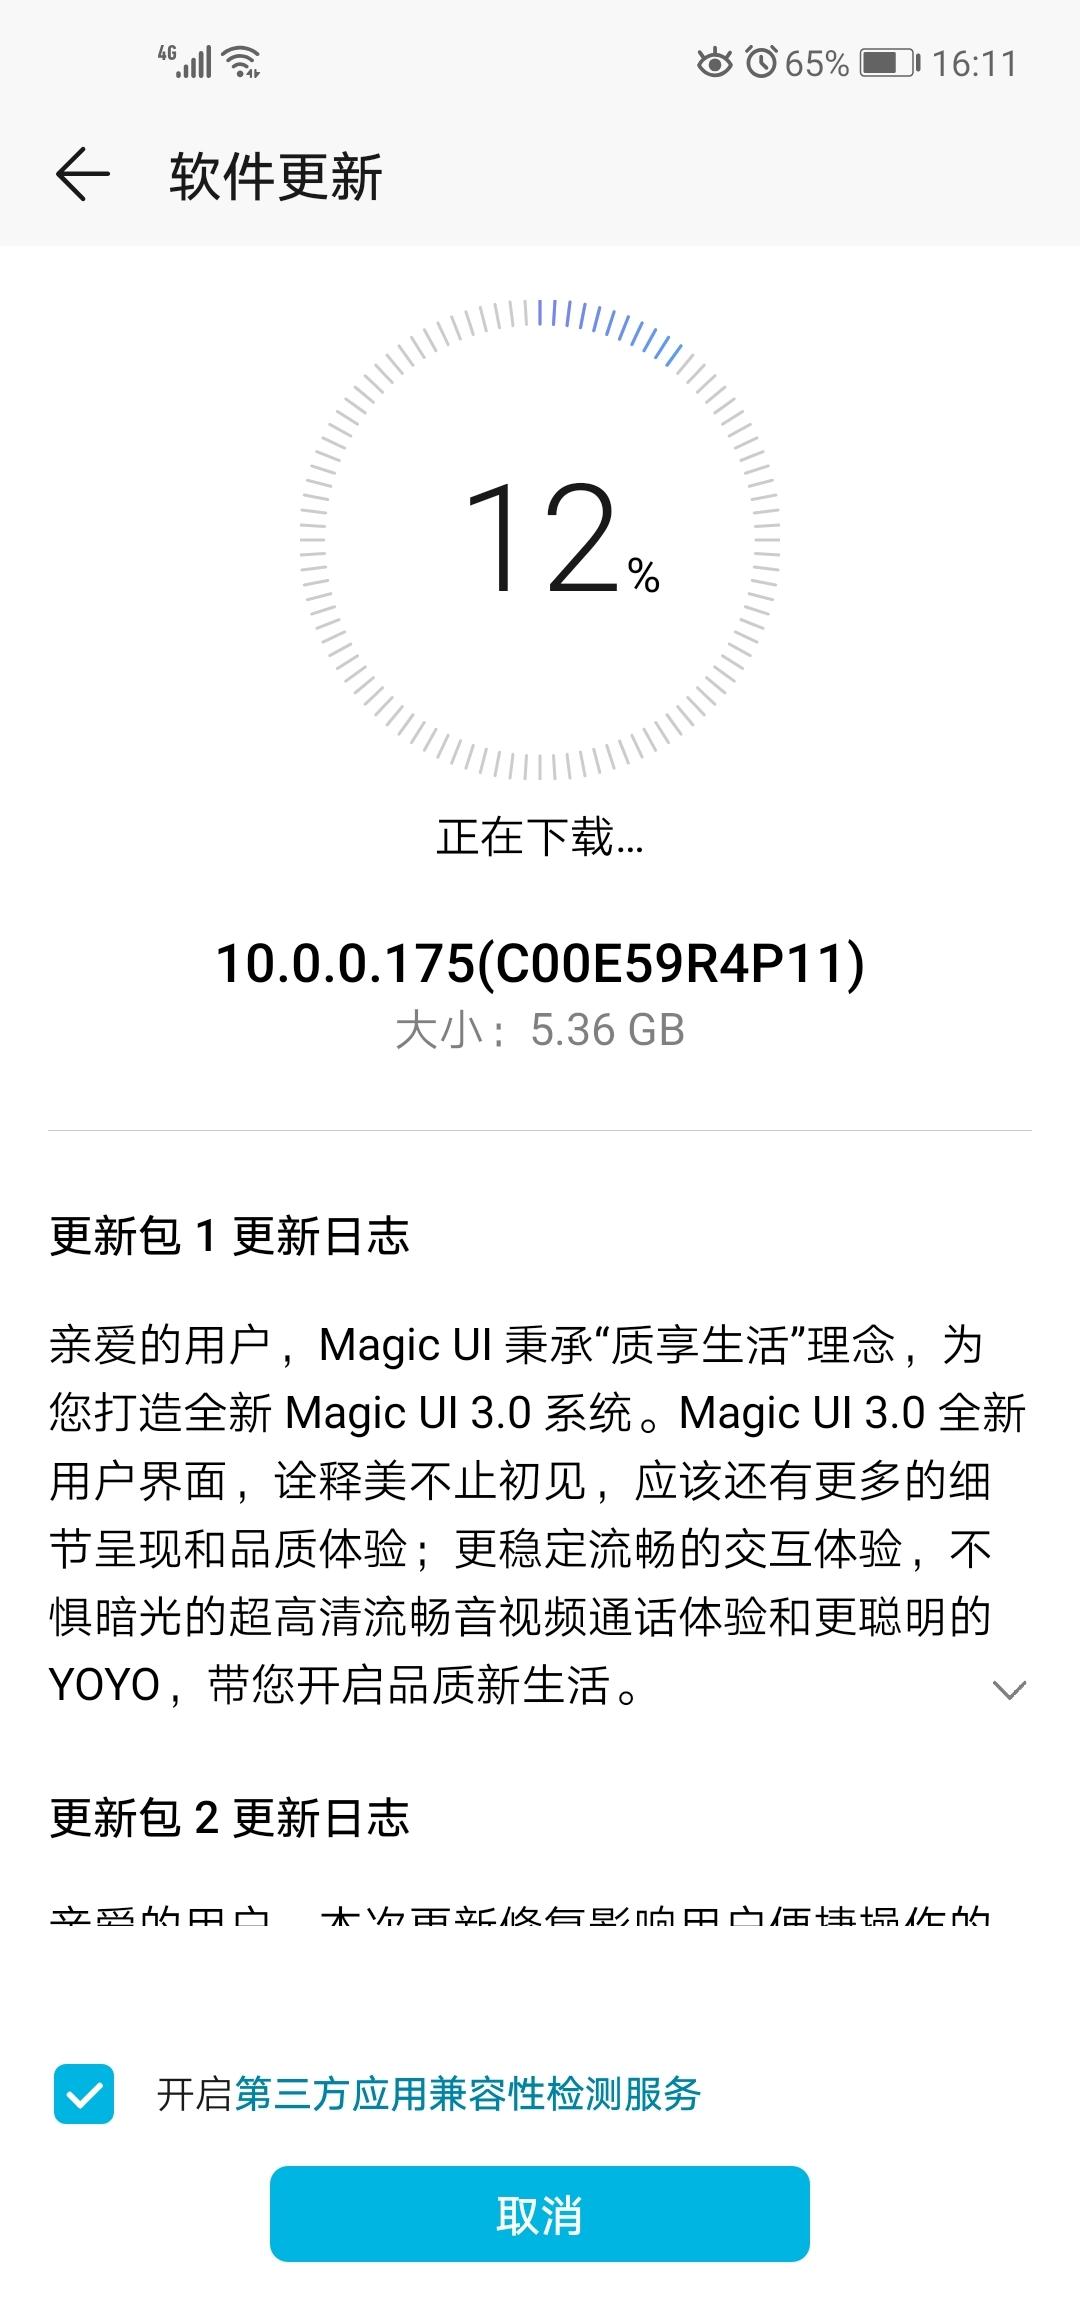 Screenshot_20200512_161148_com.huawei.android.hwouc.jpg